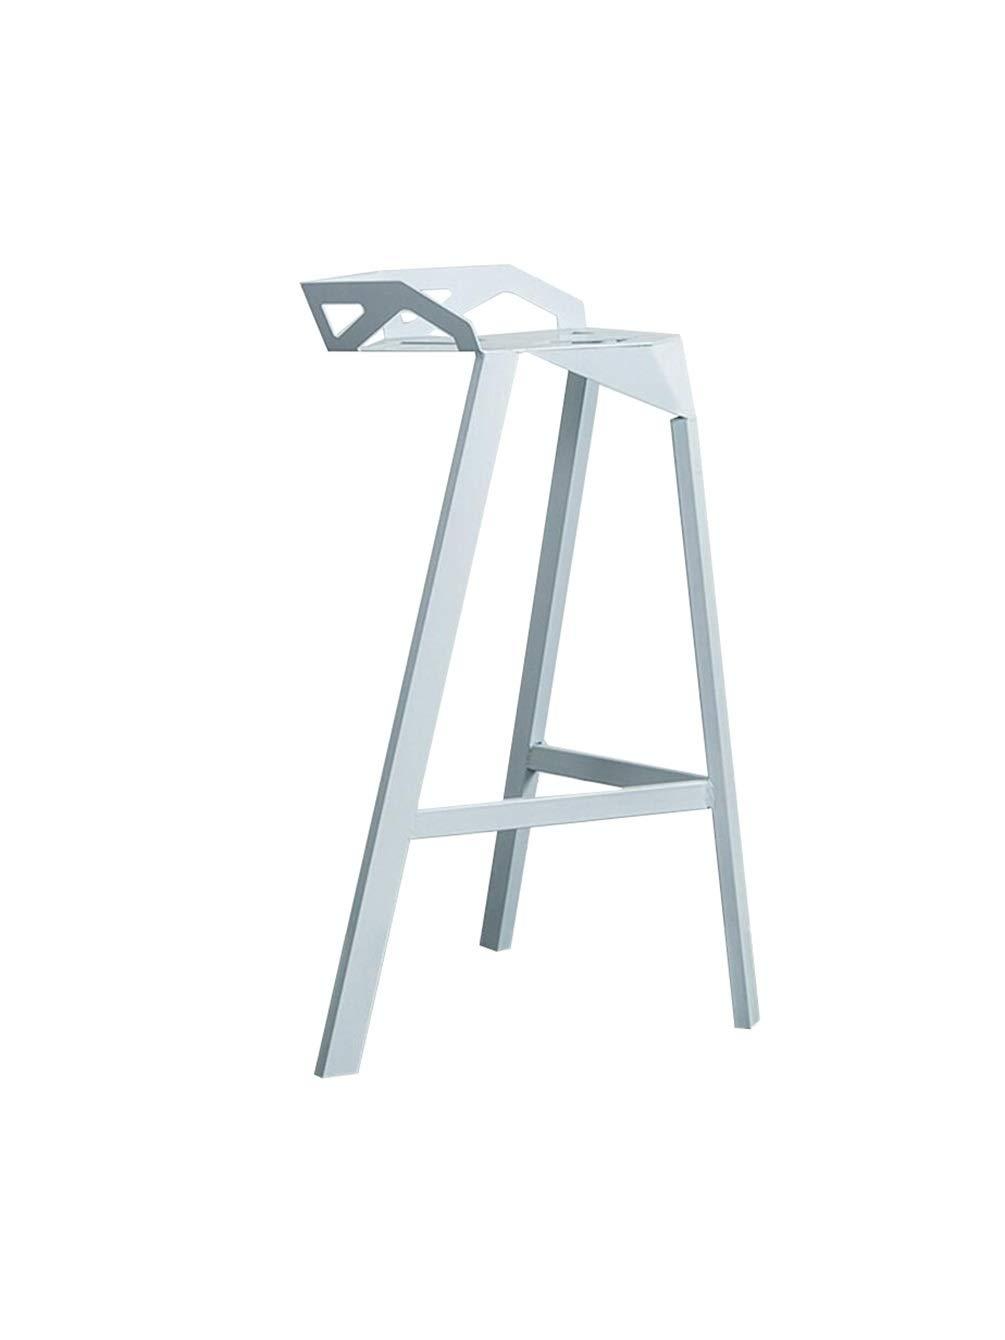 White 75cm BARSTOOLRI Bar Stool, Ergonomics Metal Adjustable Non-Slip Breakfast Stools for Kitchen Office Counter Chair (color   Black, Size   75cm)